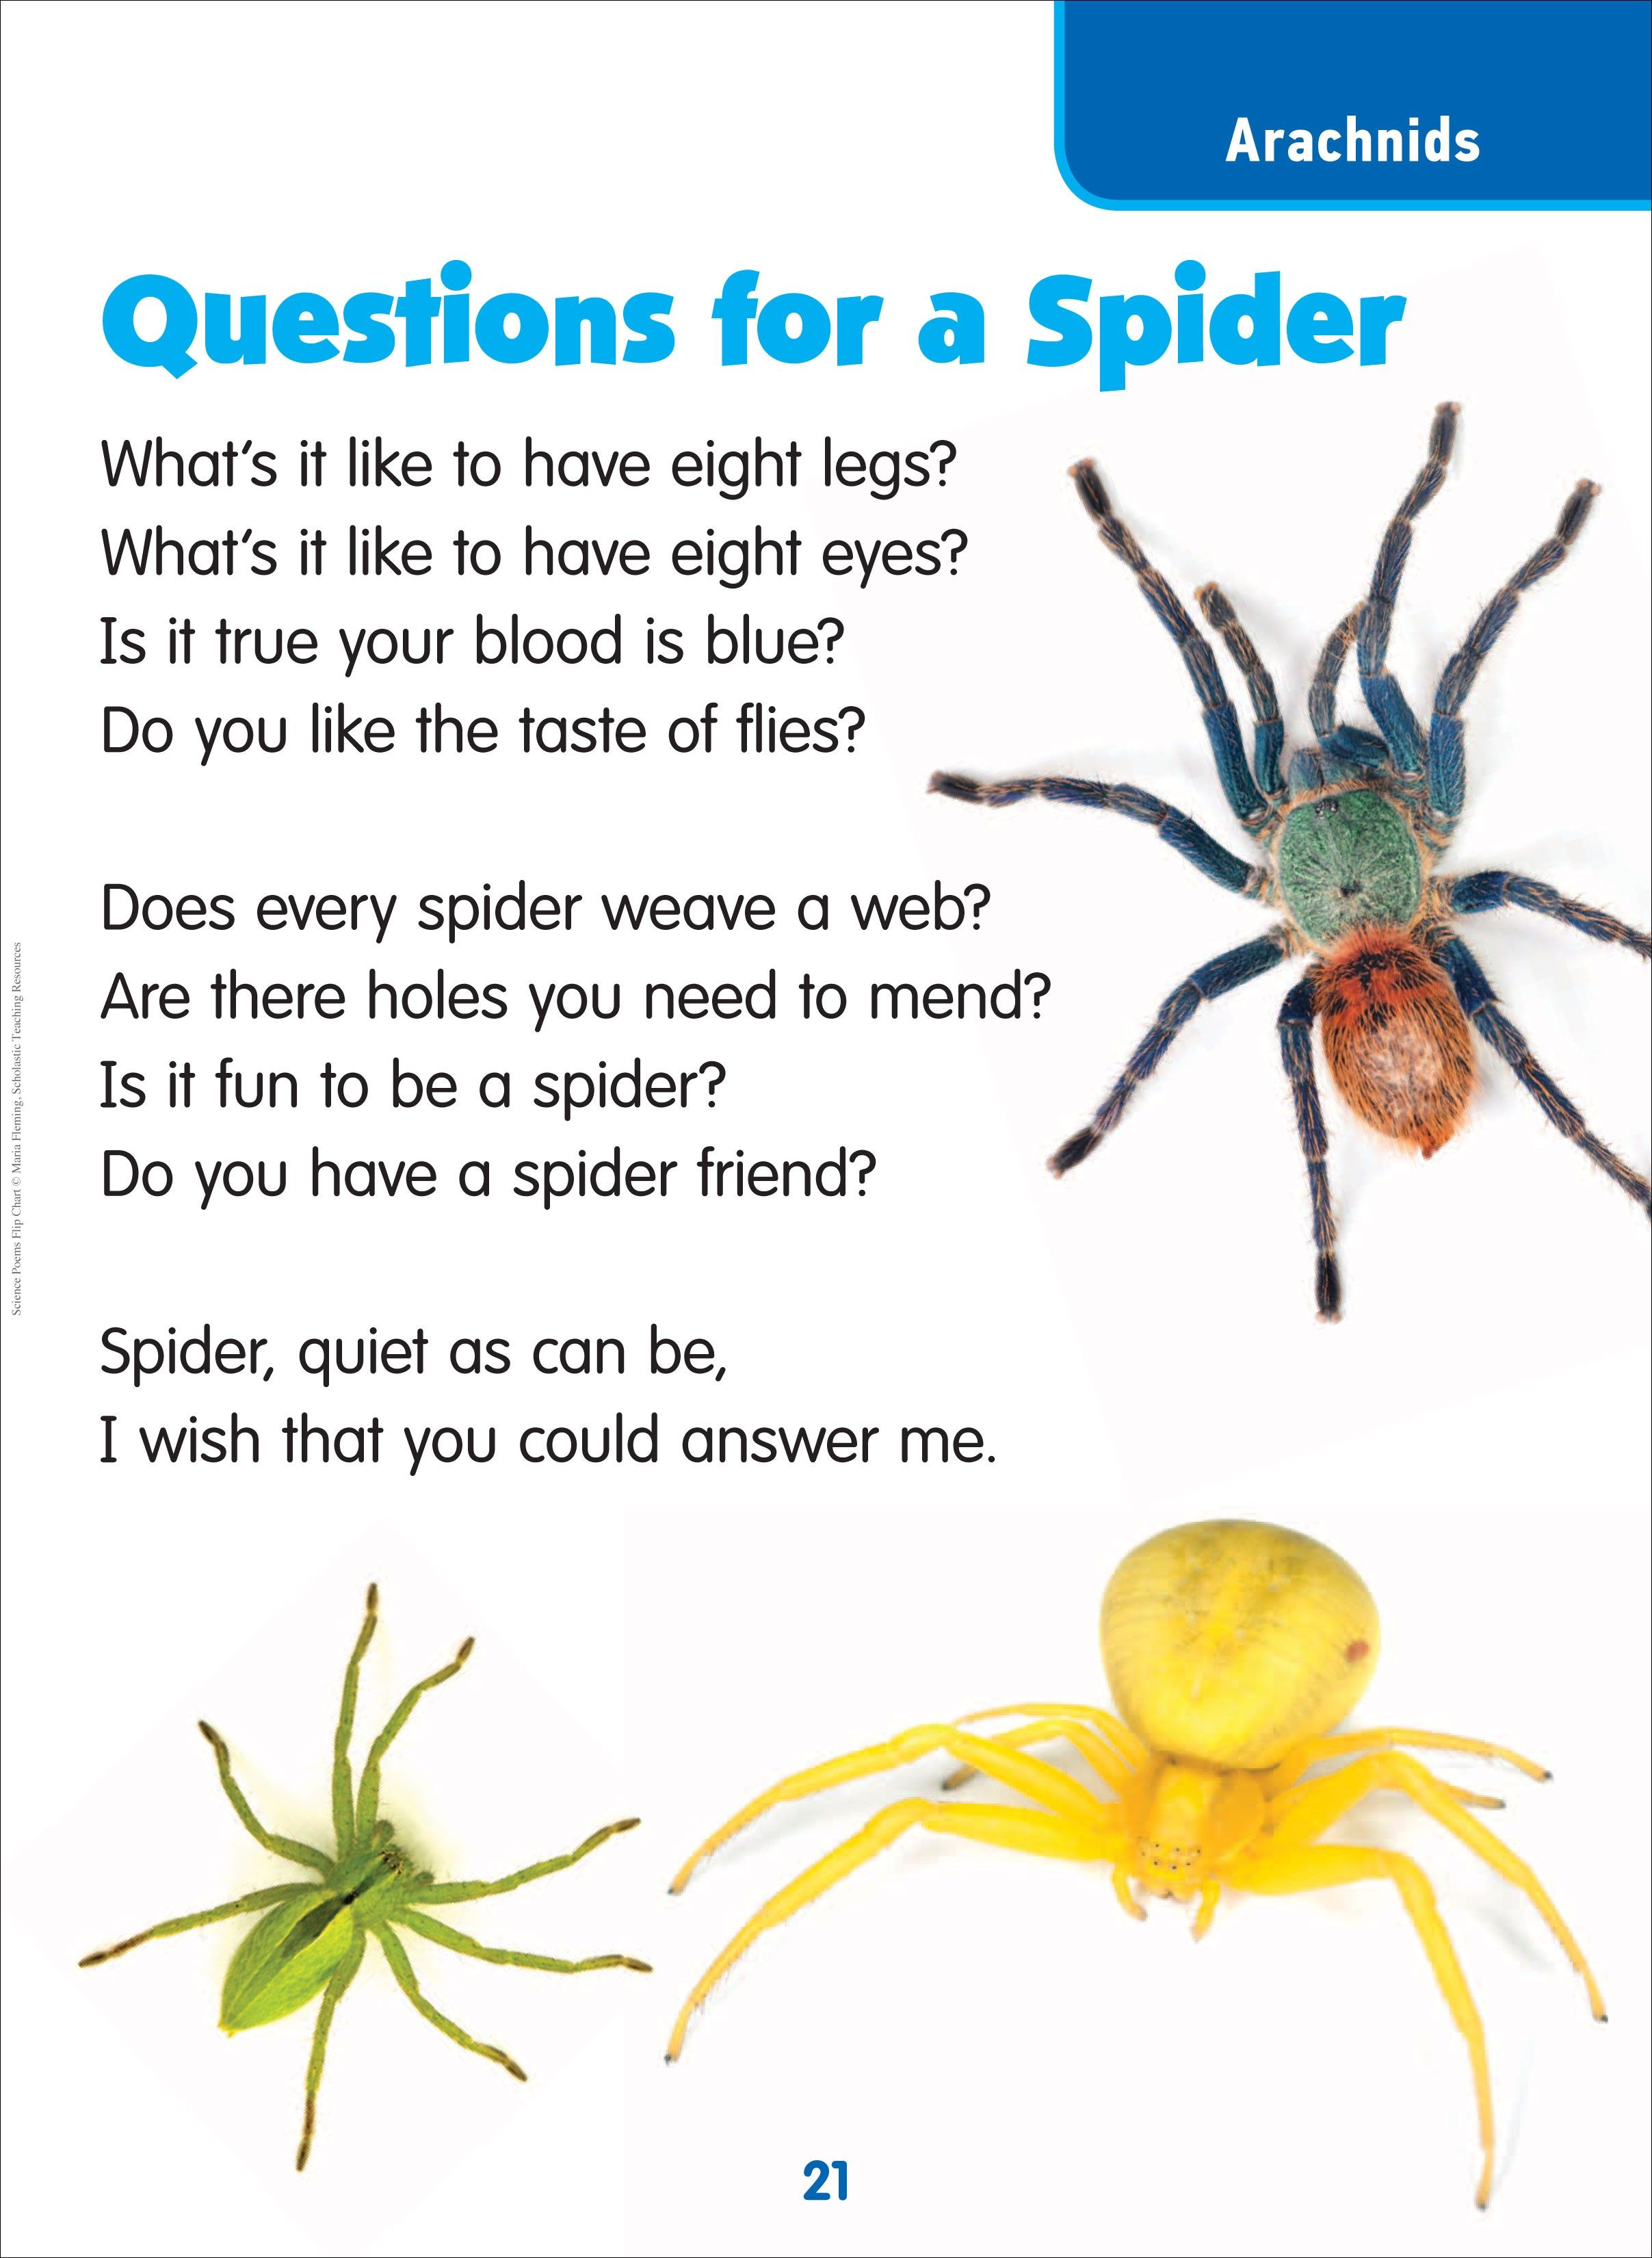 Spider poem anansi stories pinterest spider and literacy spider poem ccuart Image collections